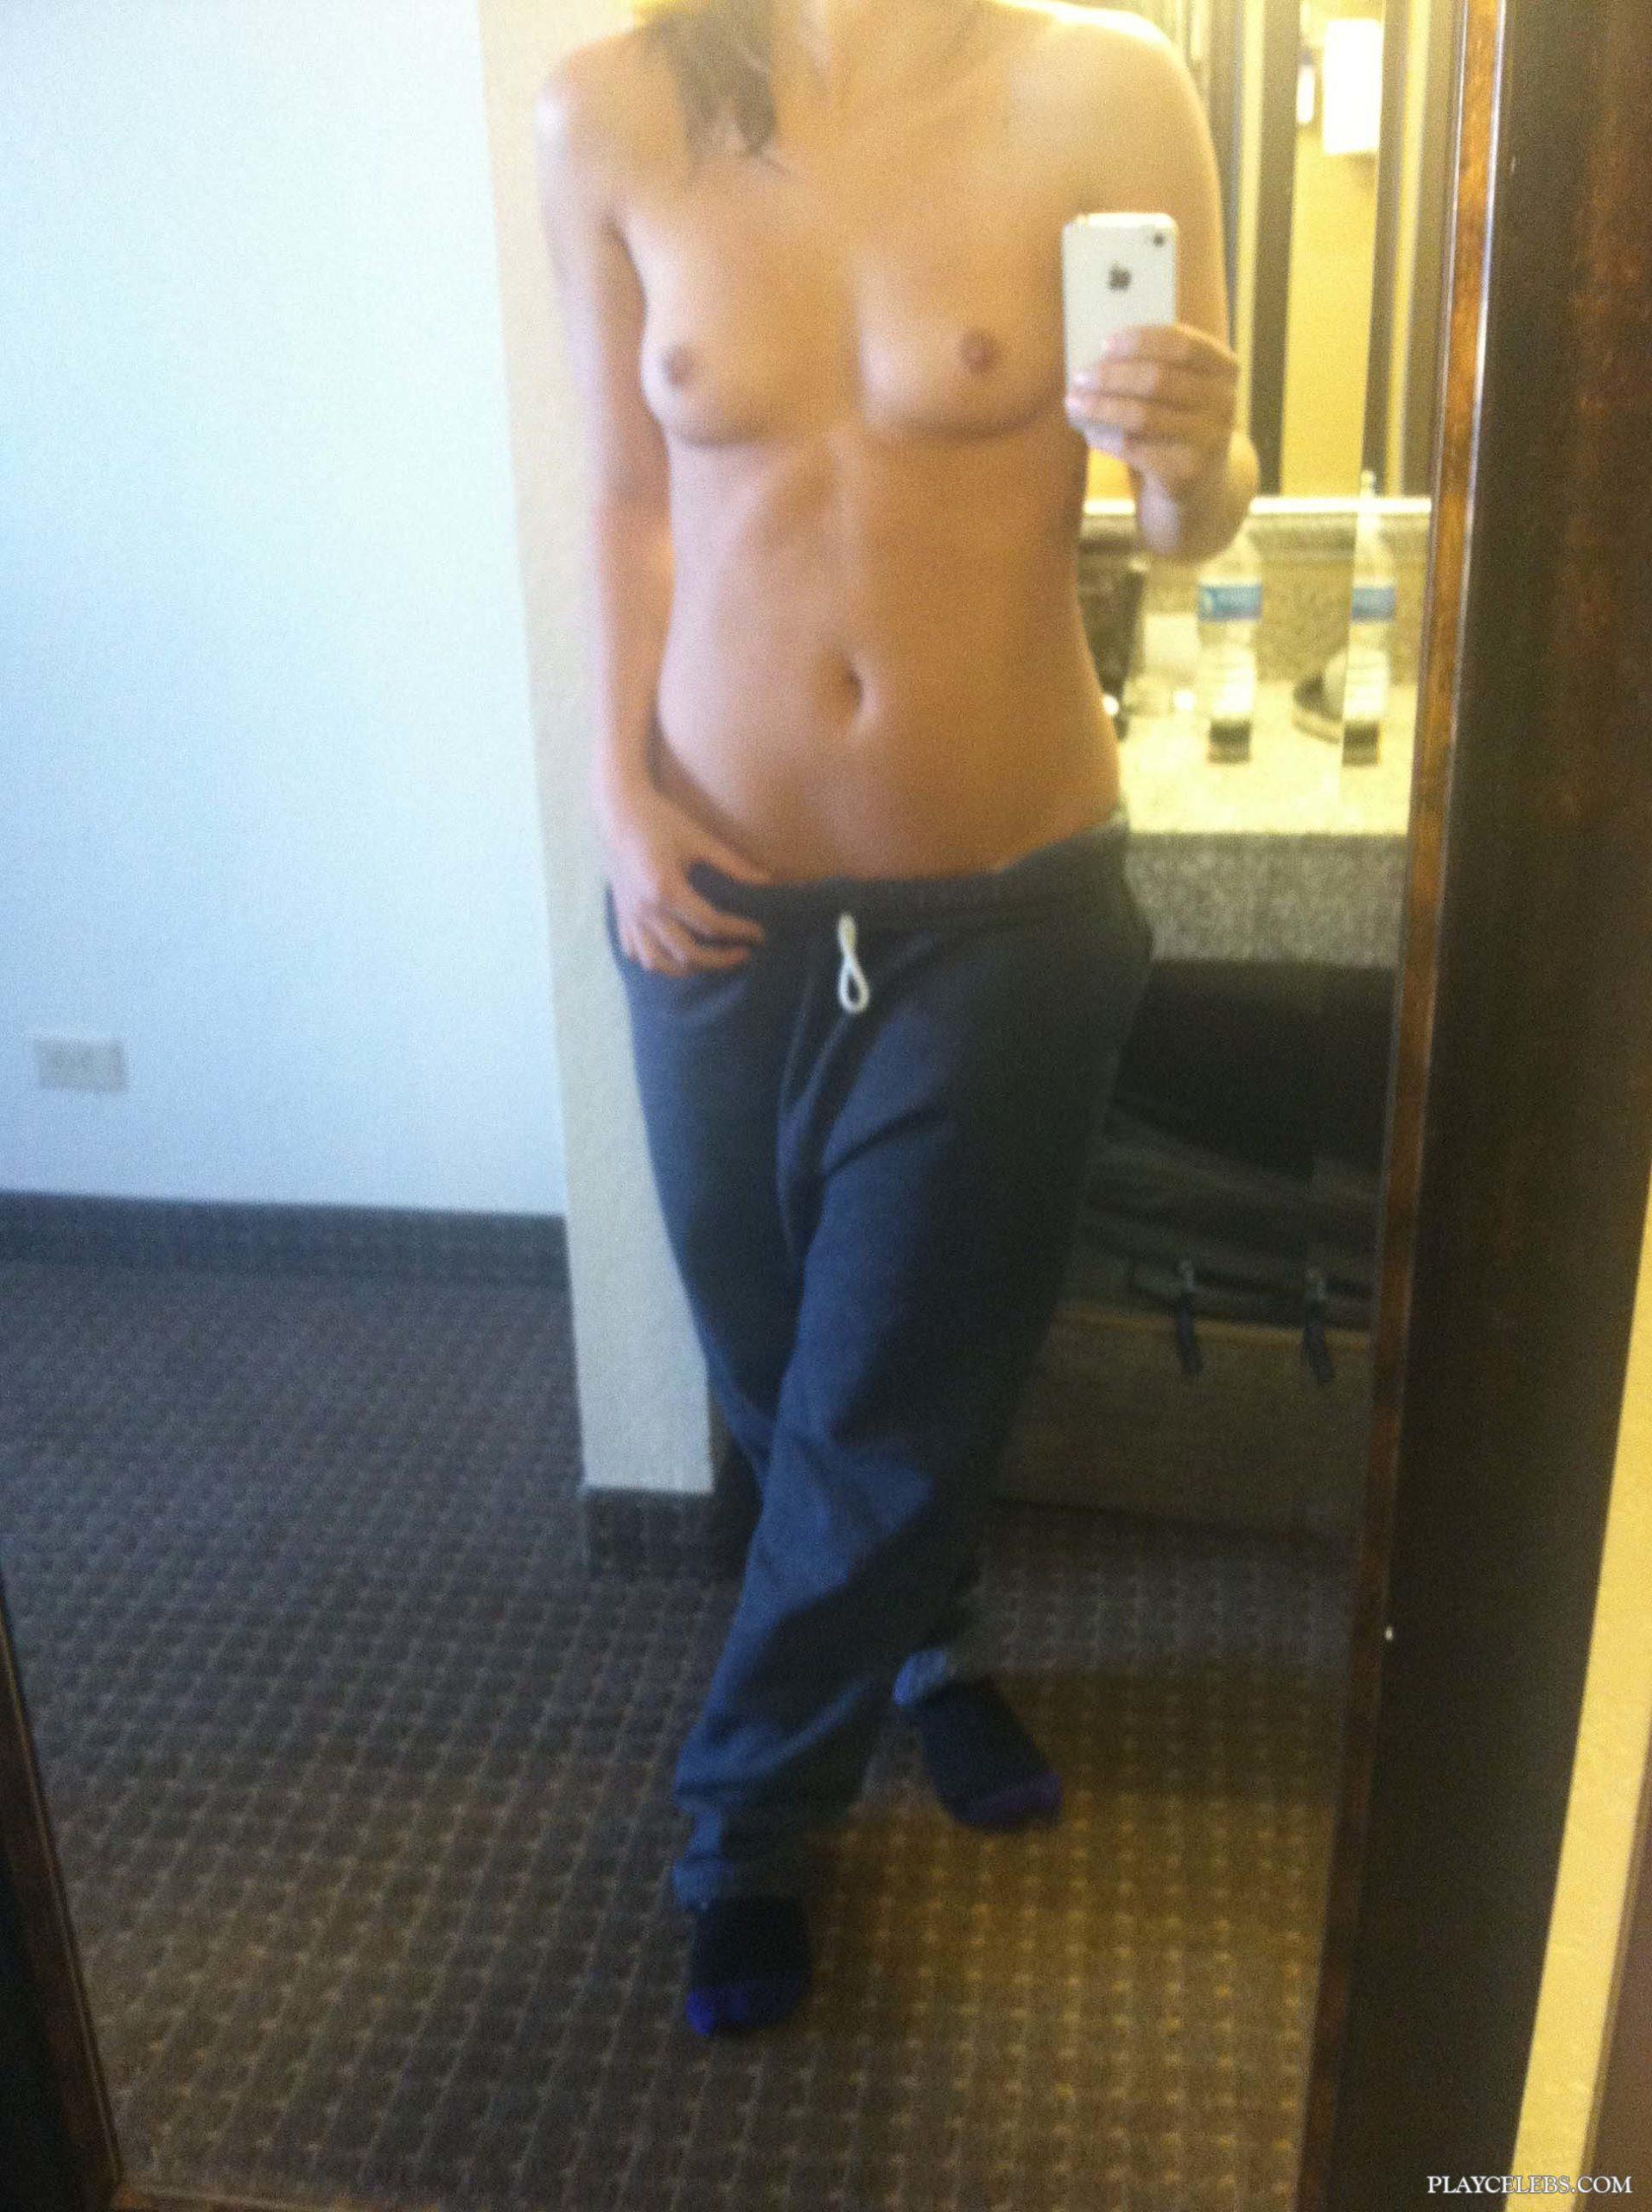 Briana Evigan Leaked Nude Pics And Sex Movie Scenes